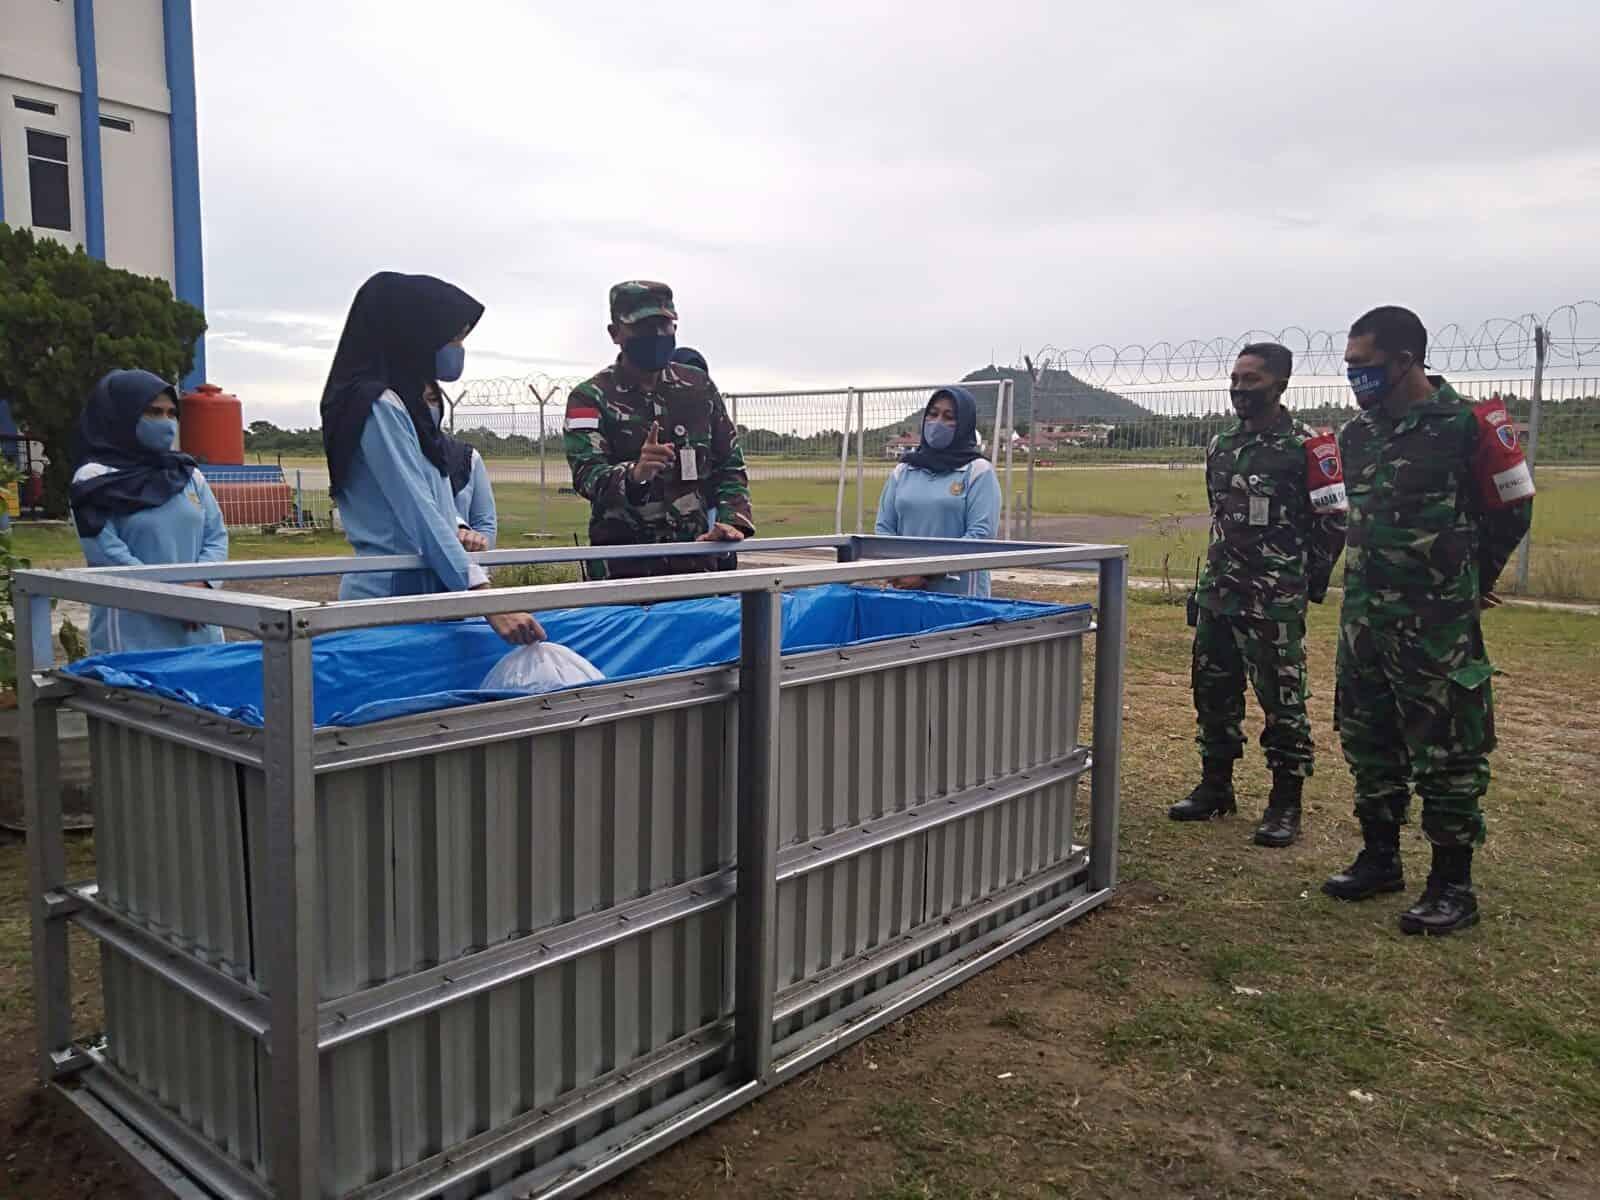 Dalam Mendukung Program Pemerintah Terkait Ketahanan Pangan, Komandan Lanud Maimun Saleh Menyerahkan Benih Ikan Lele Kepada Ketua Pia Ardhya Garini Cabang 16 Daerah I Lanud Mus.